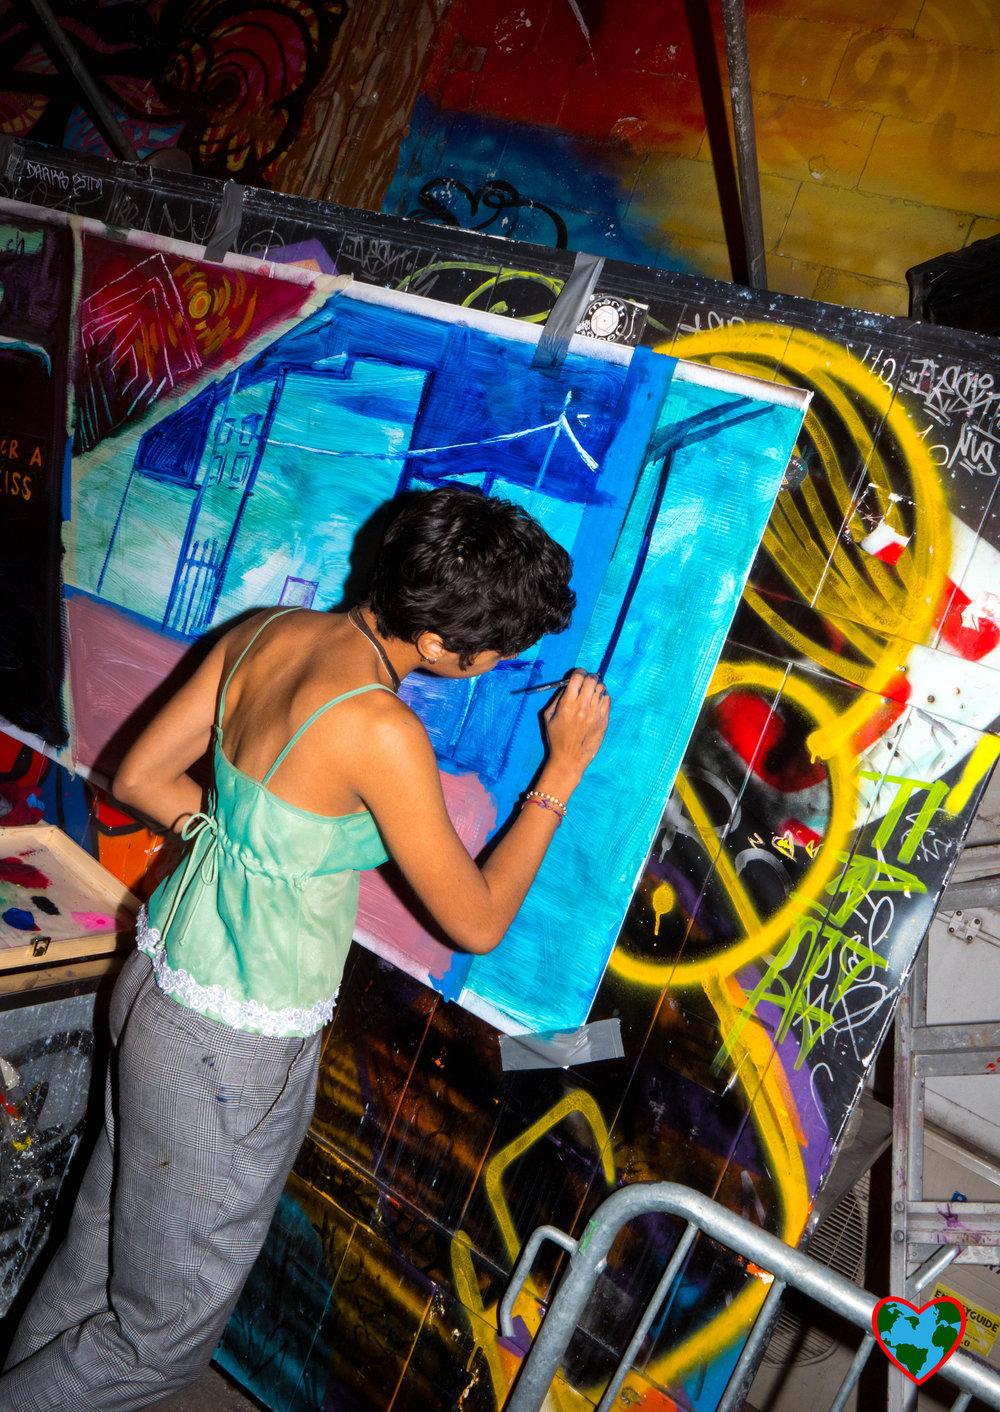 lady painting-1188262.jpg